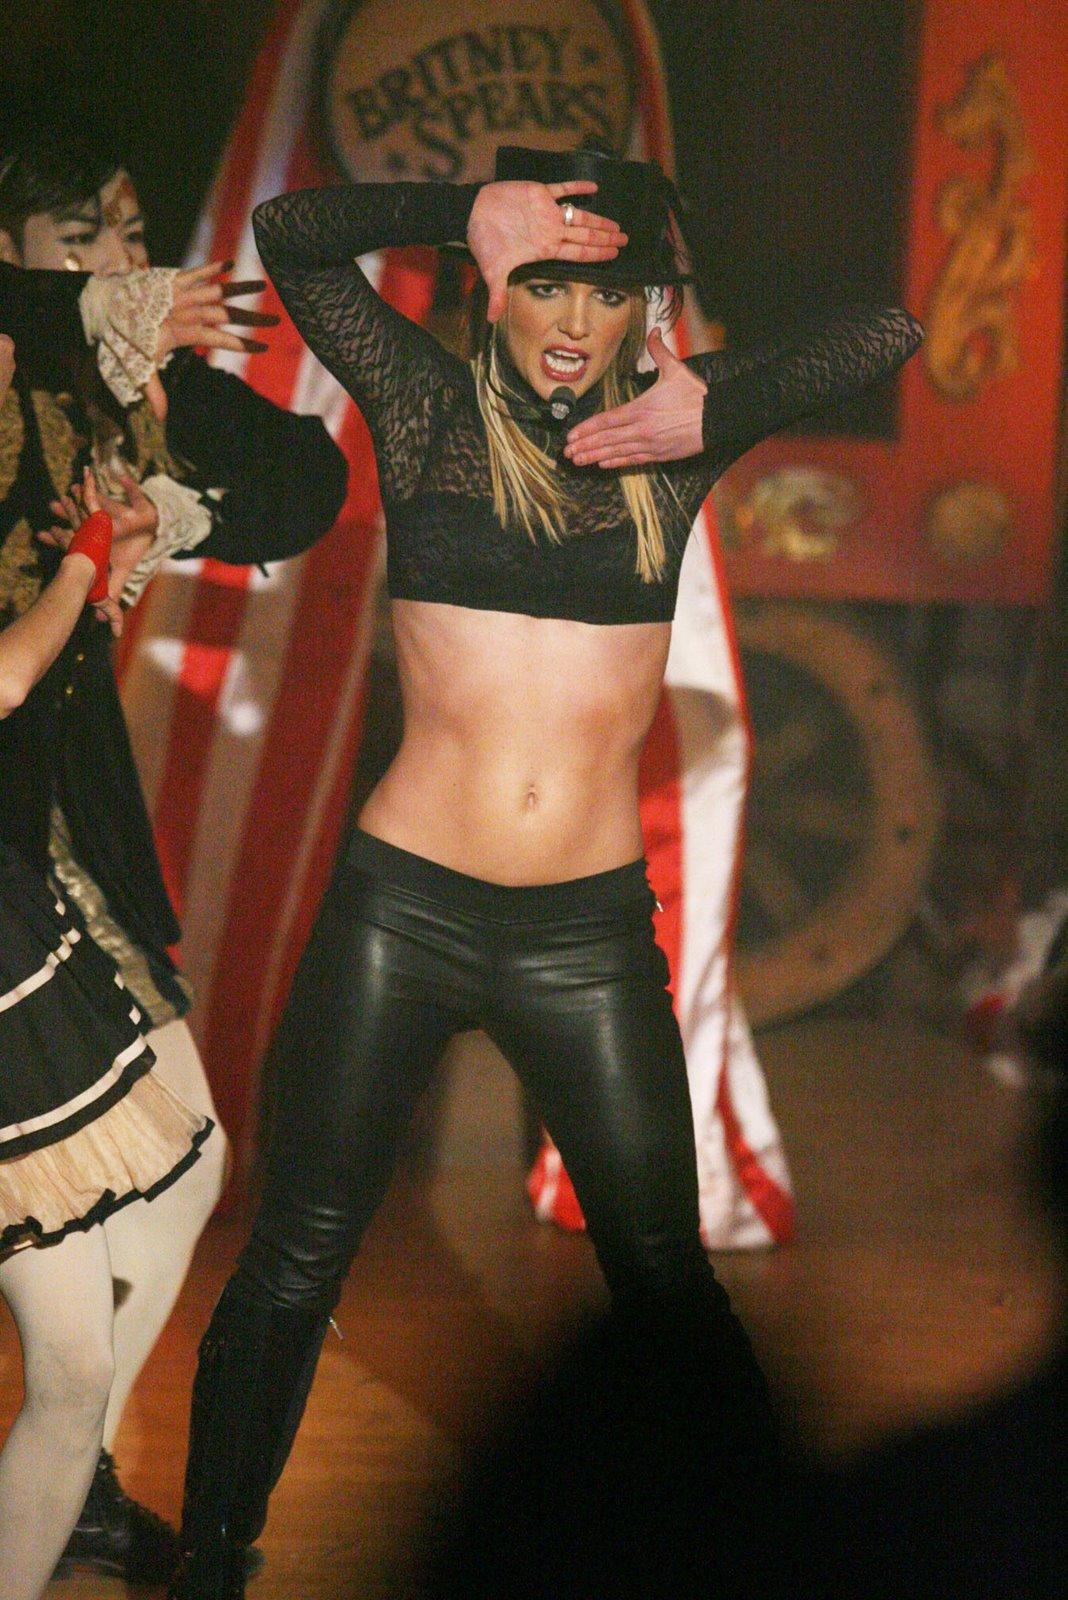 http://1.bp.blogspot.com/_K3hKxrxQGBk/SwFe_nqnsfI/AAAAAAAAKNQ/ks4wpnGvF3o/s1600/Britney+Spears+Circus+Does+Good+Morning+America+!+3.jpg